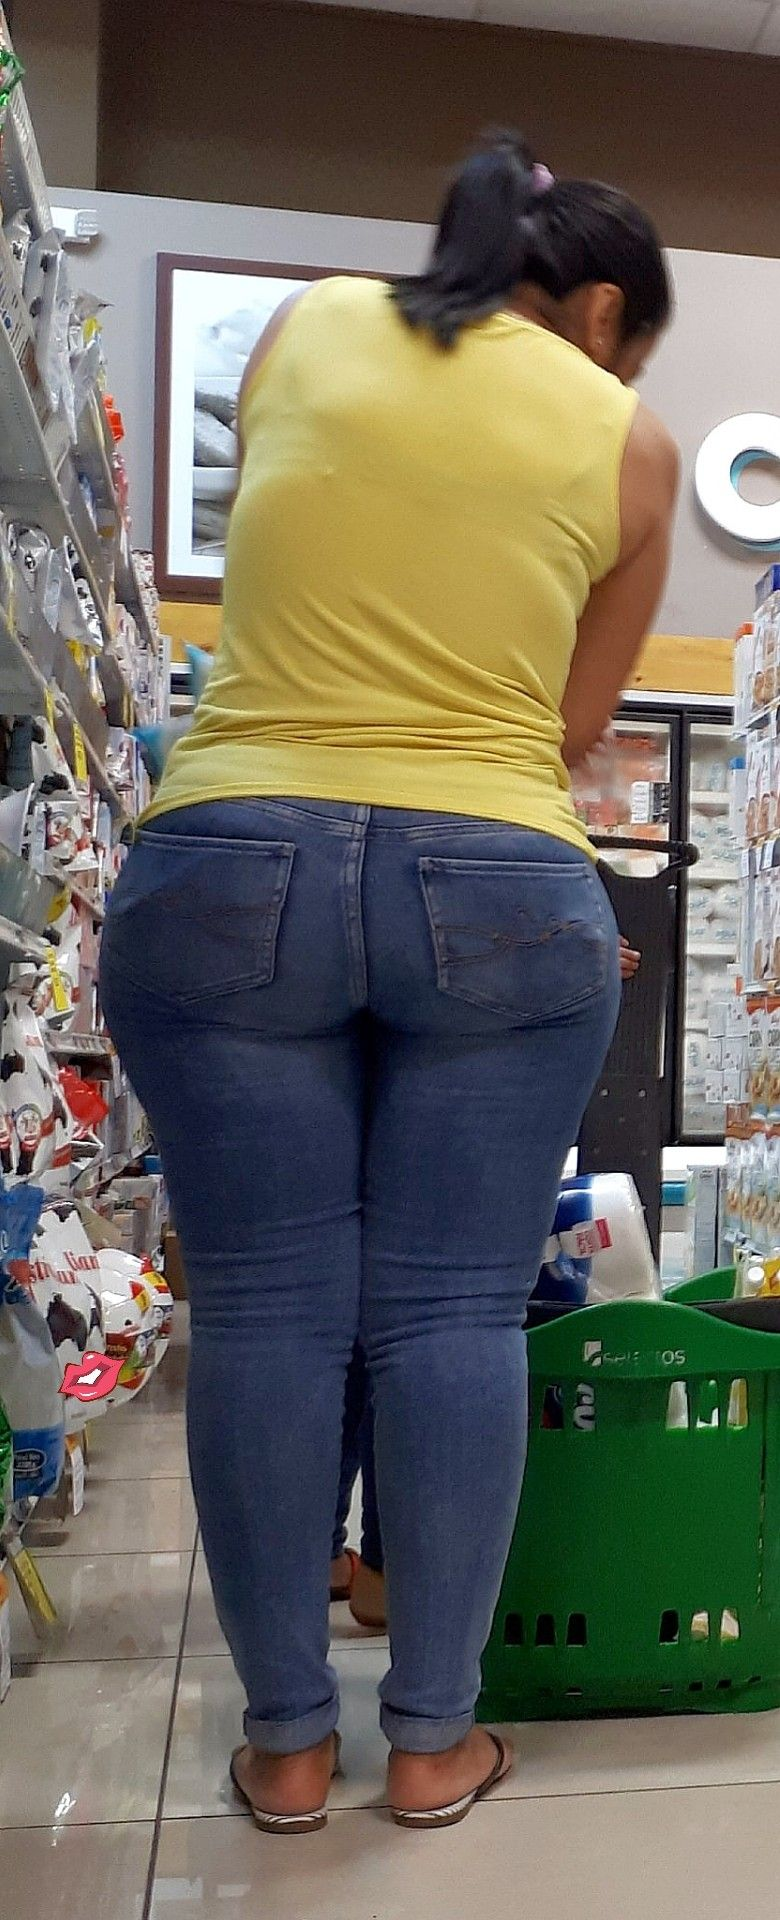 fat chick anal